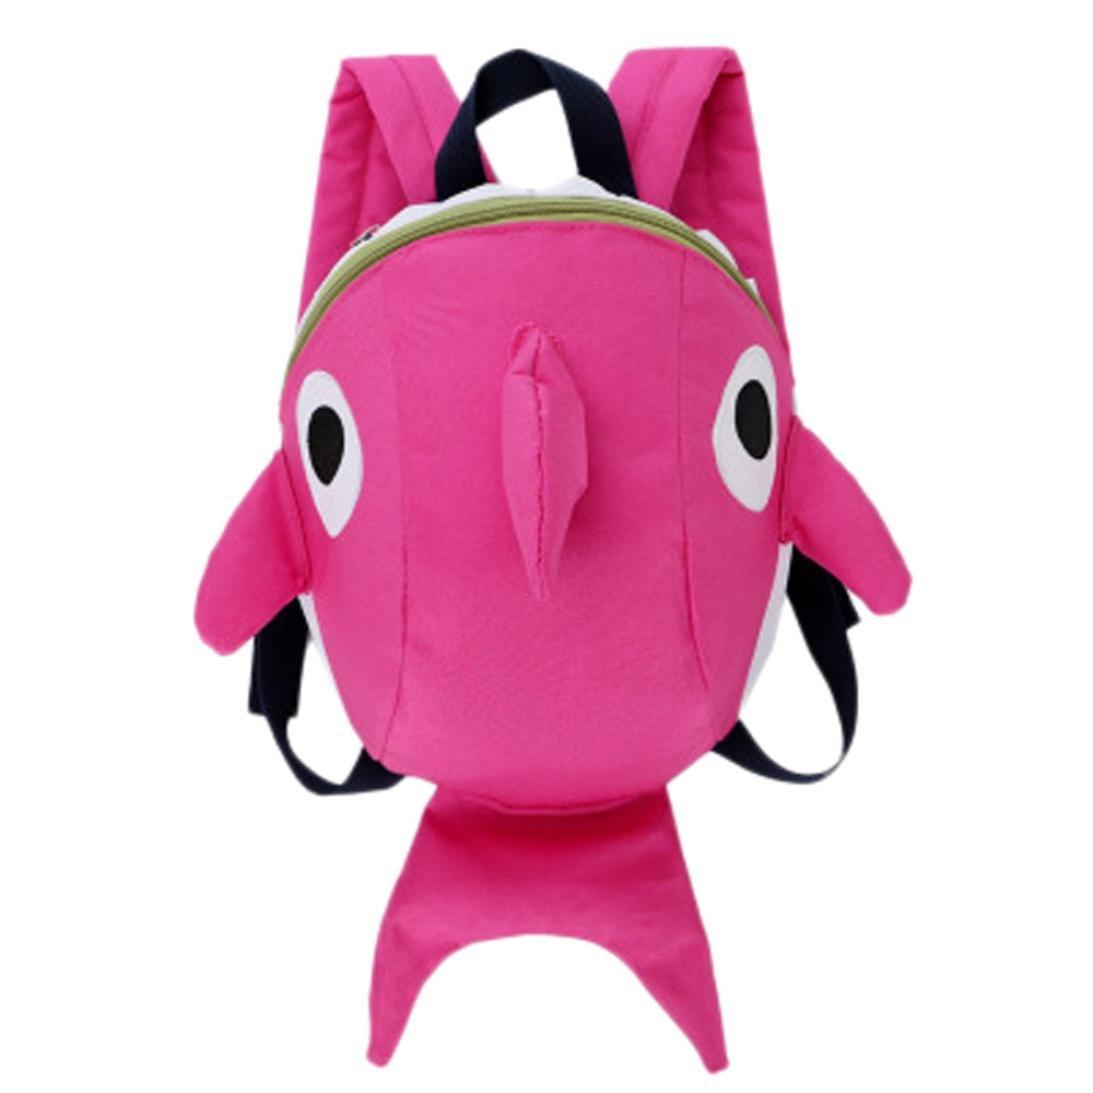 Cinhent バックパック 子供用 アニメ サメ 幼児 赤ちゃん 女の子 男の子 ブックバッグ  ピンク B07FQ4GJWG